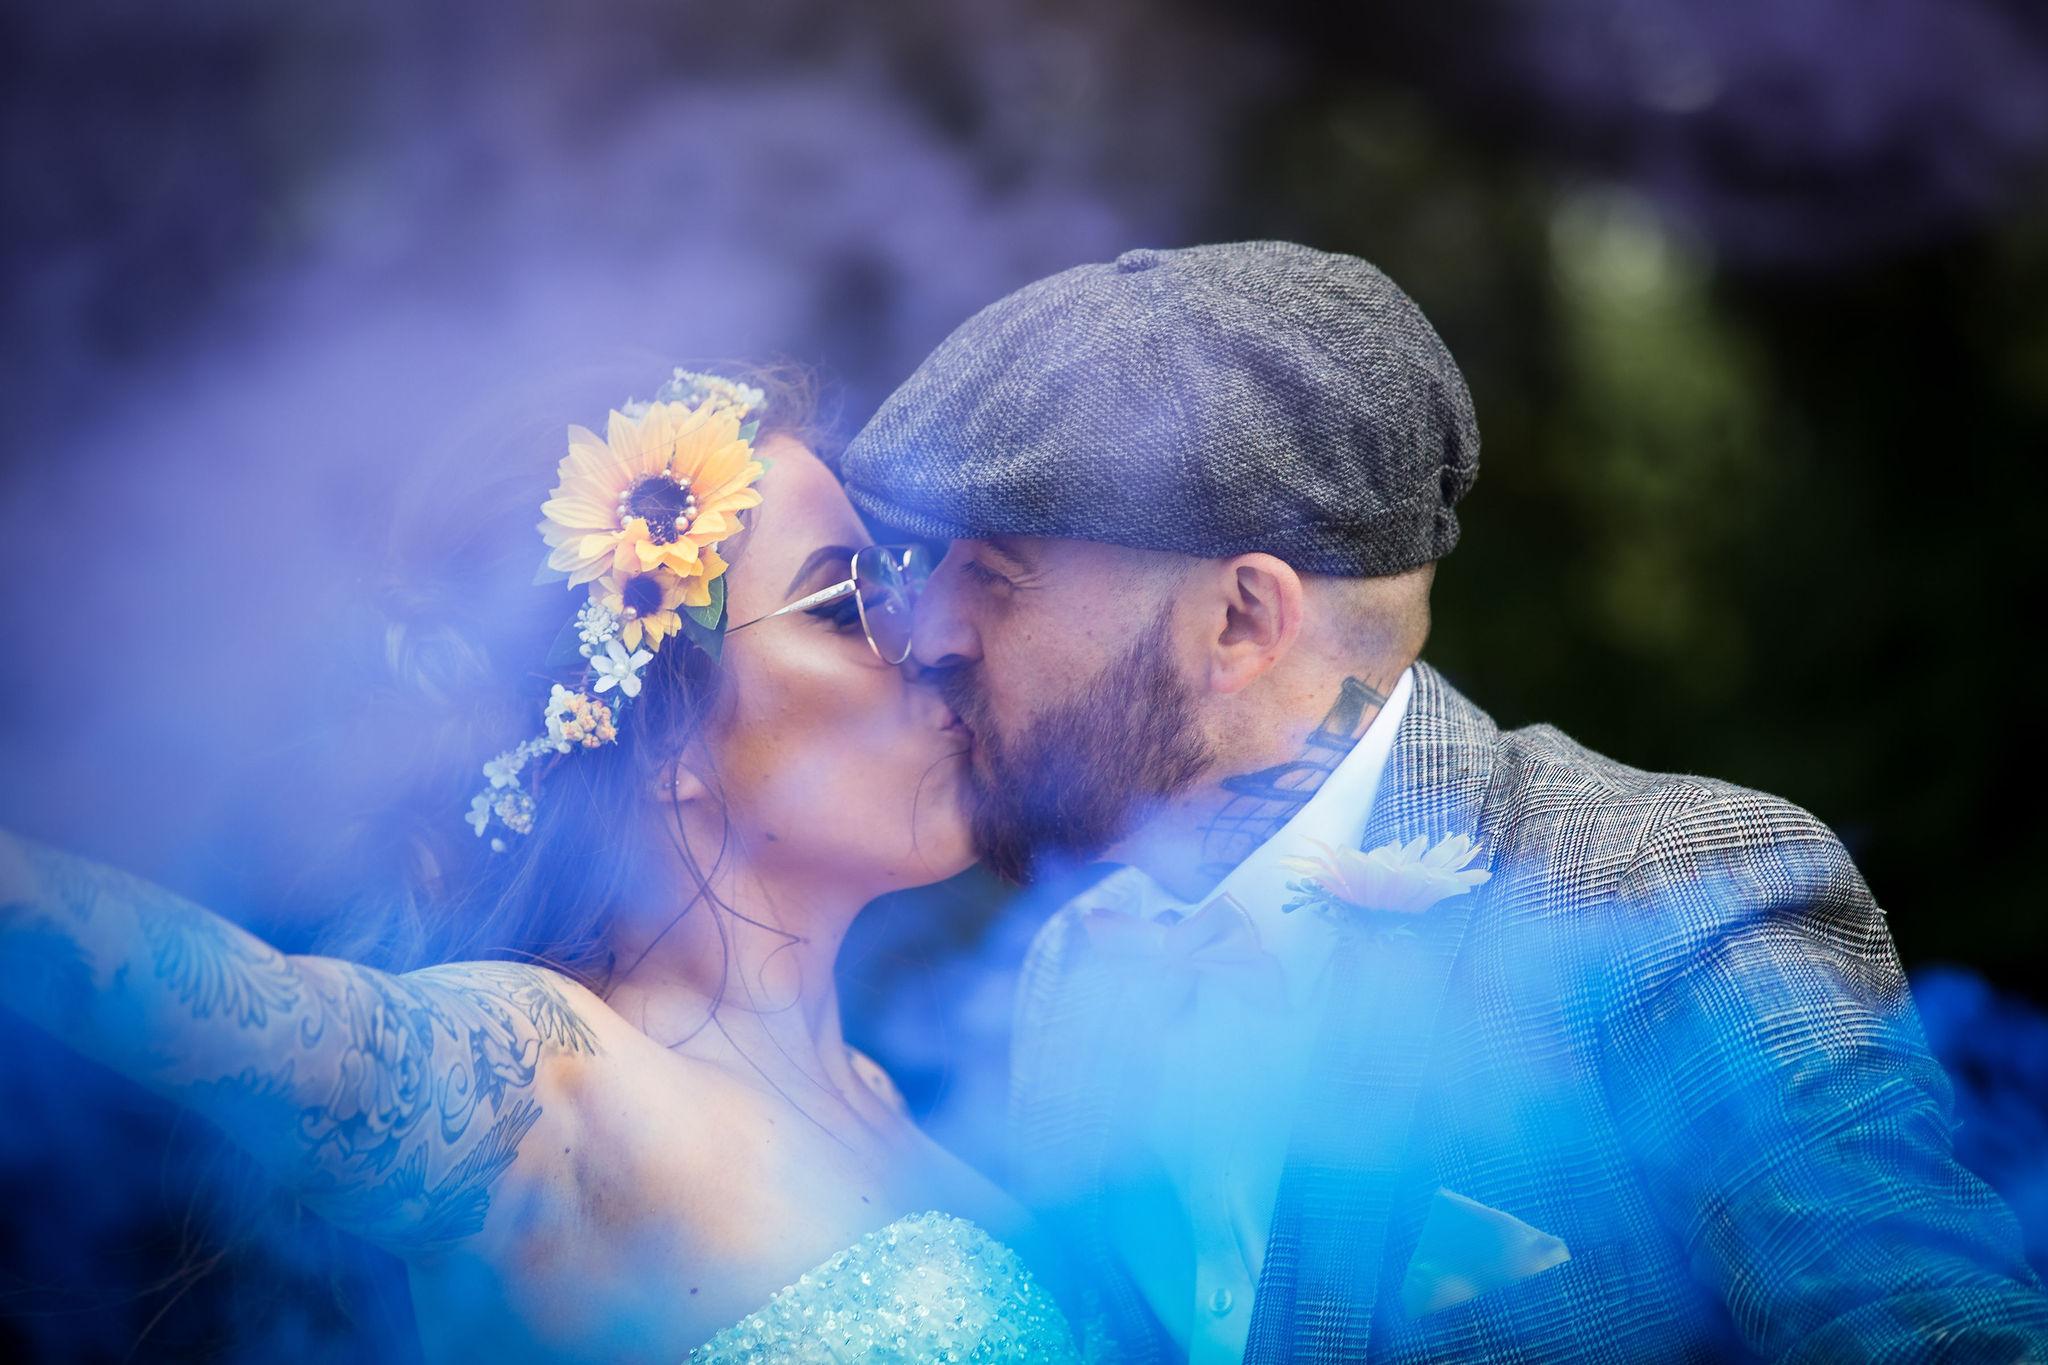 Harriet&Rhys Wedding - alternative wedding couple shot with smokebombs - tattooed bride